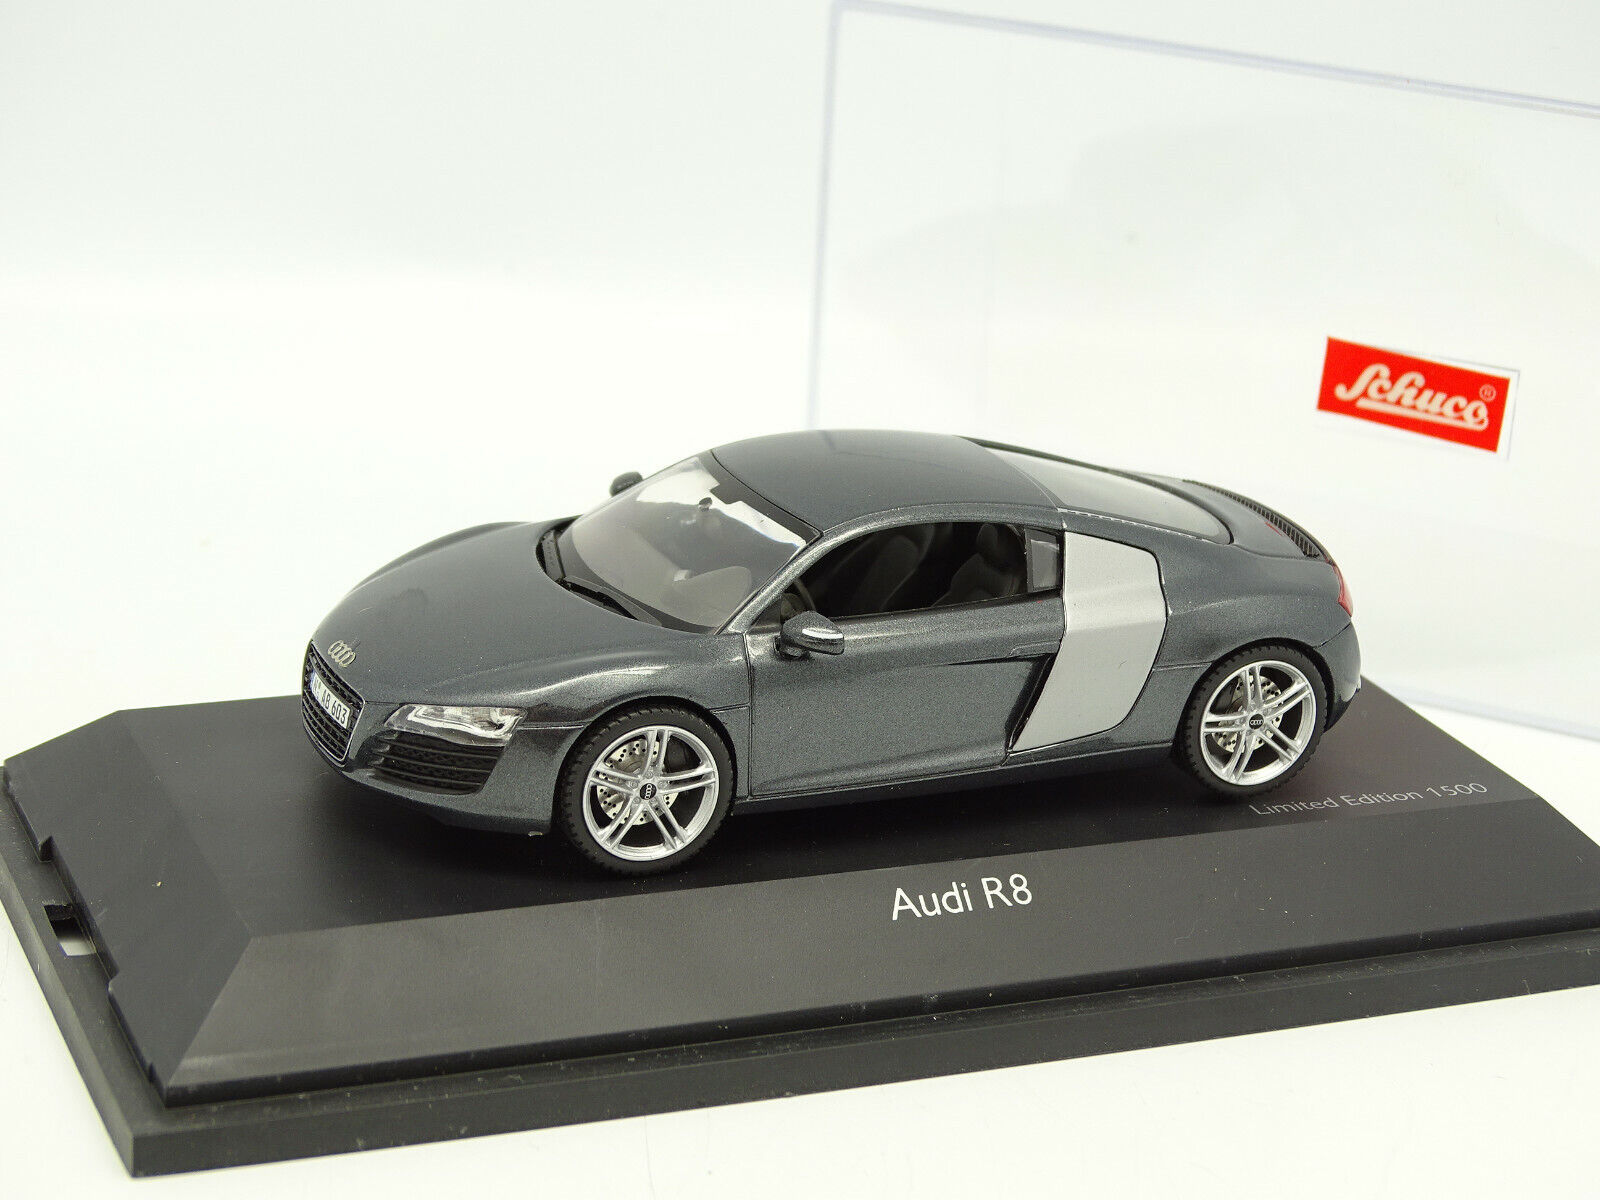 Schuco 1 43 - Audi R8 grey Anthrazit